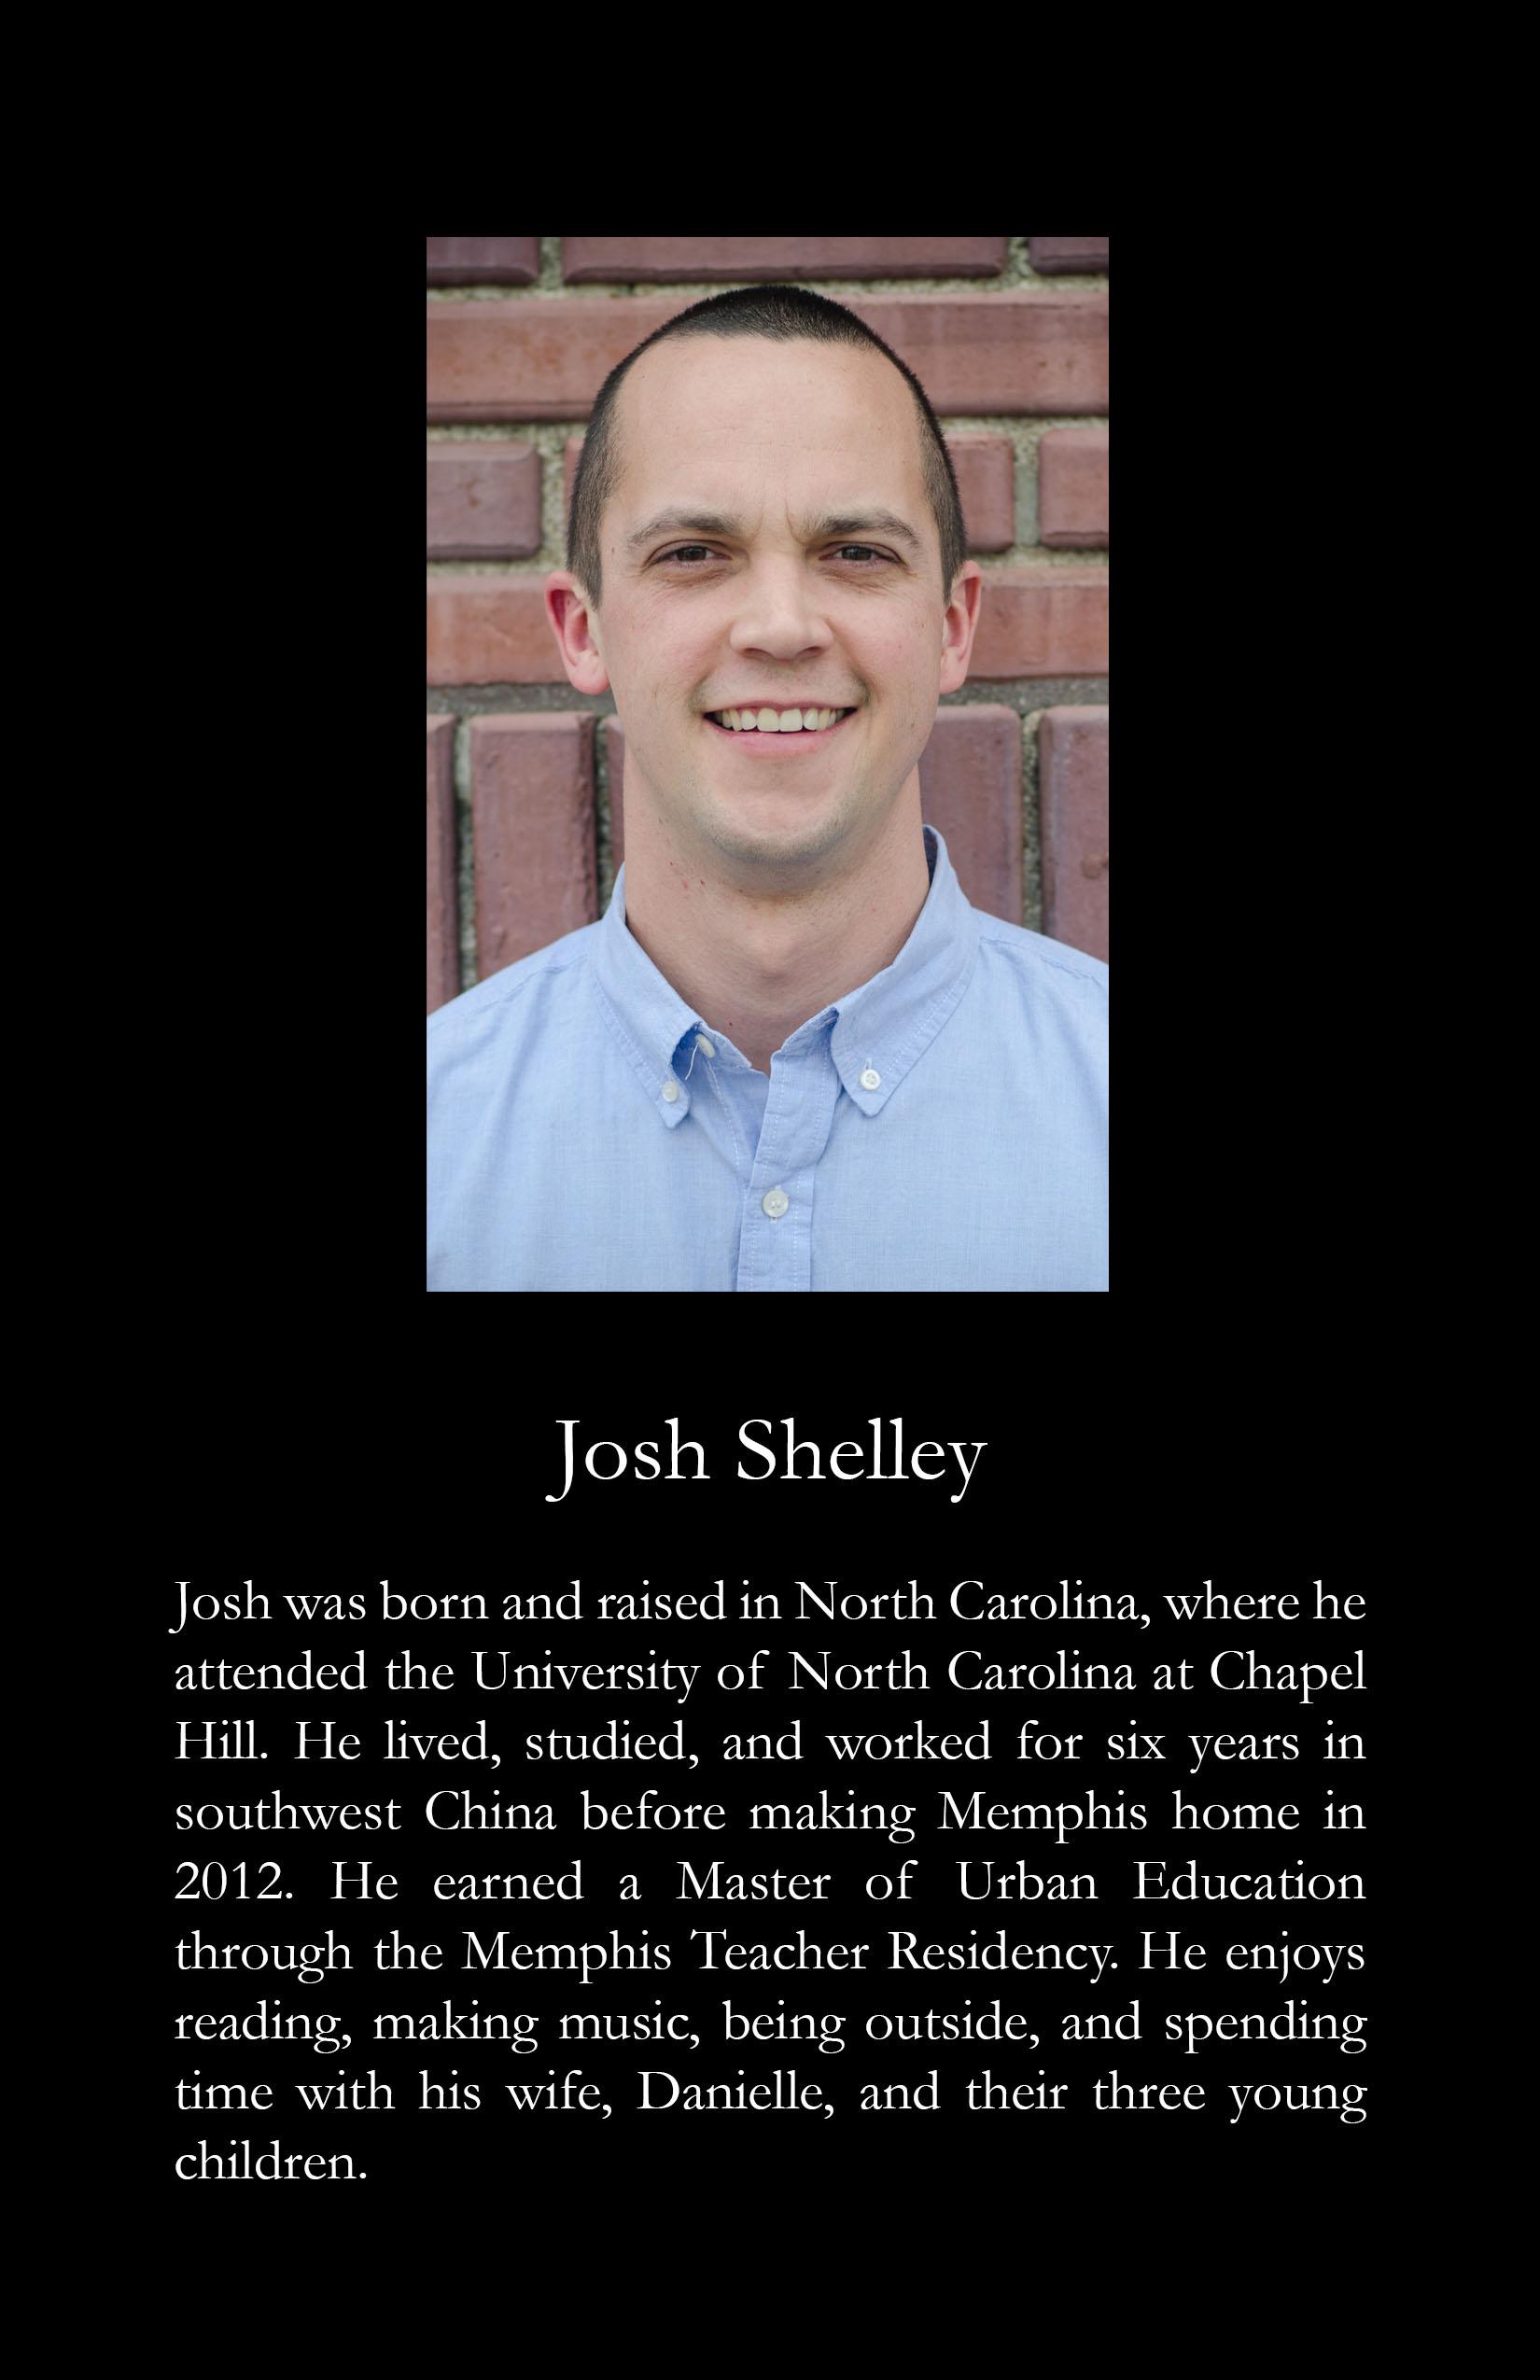 Josh Shelley.jpg